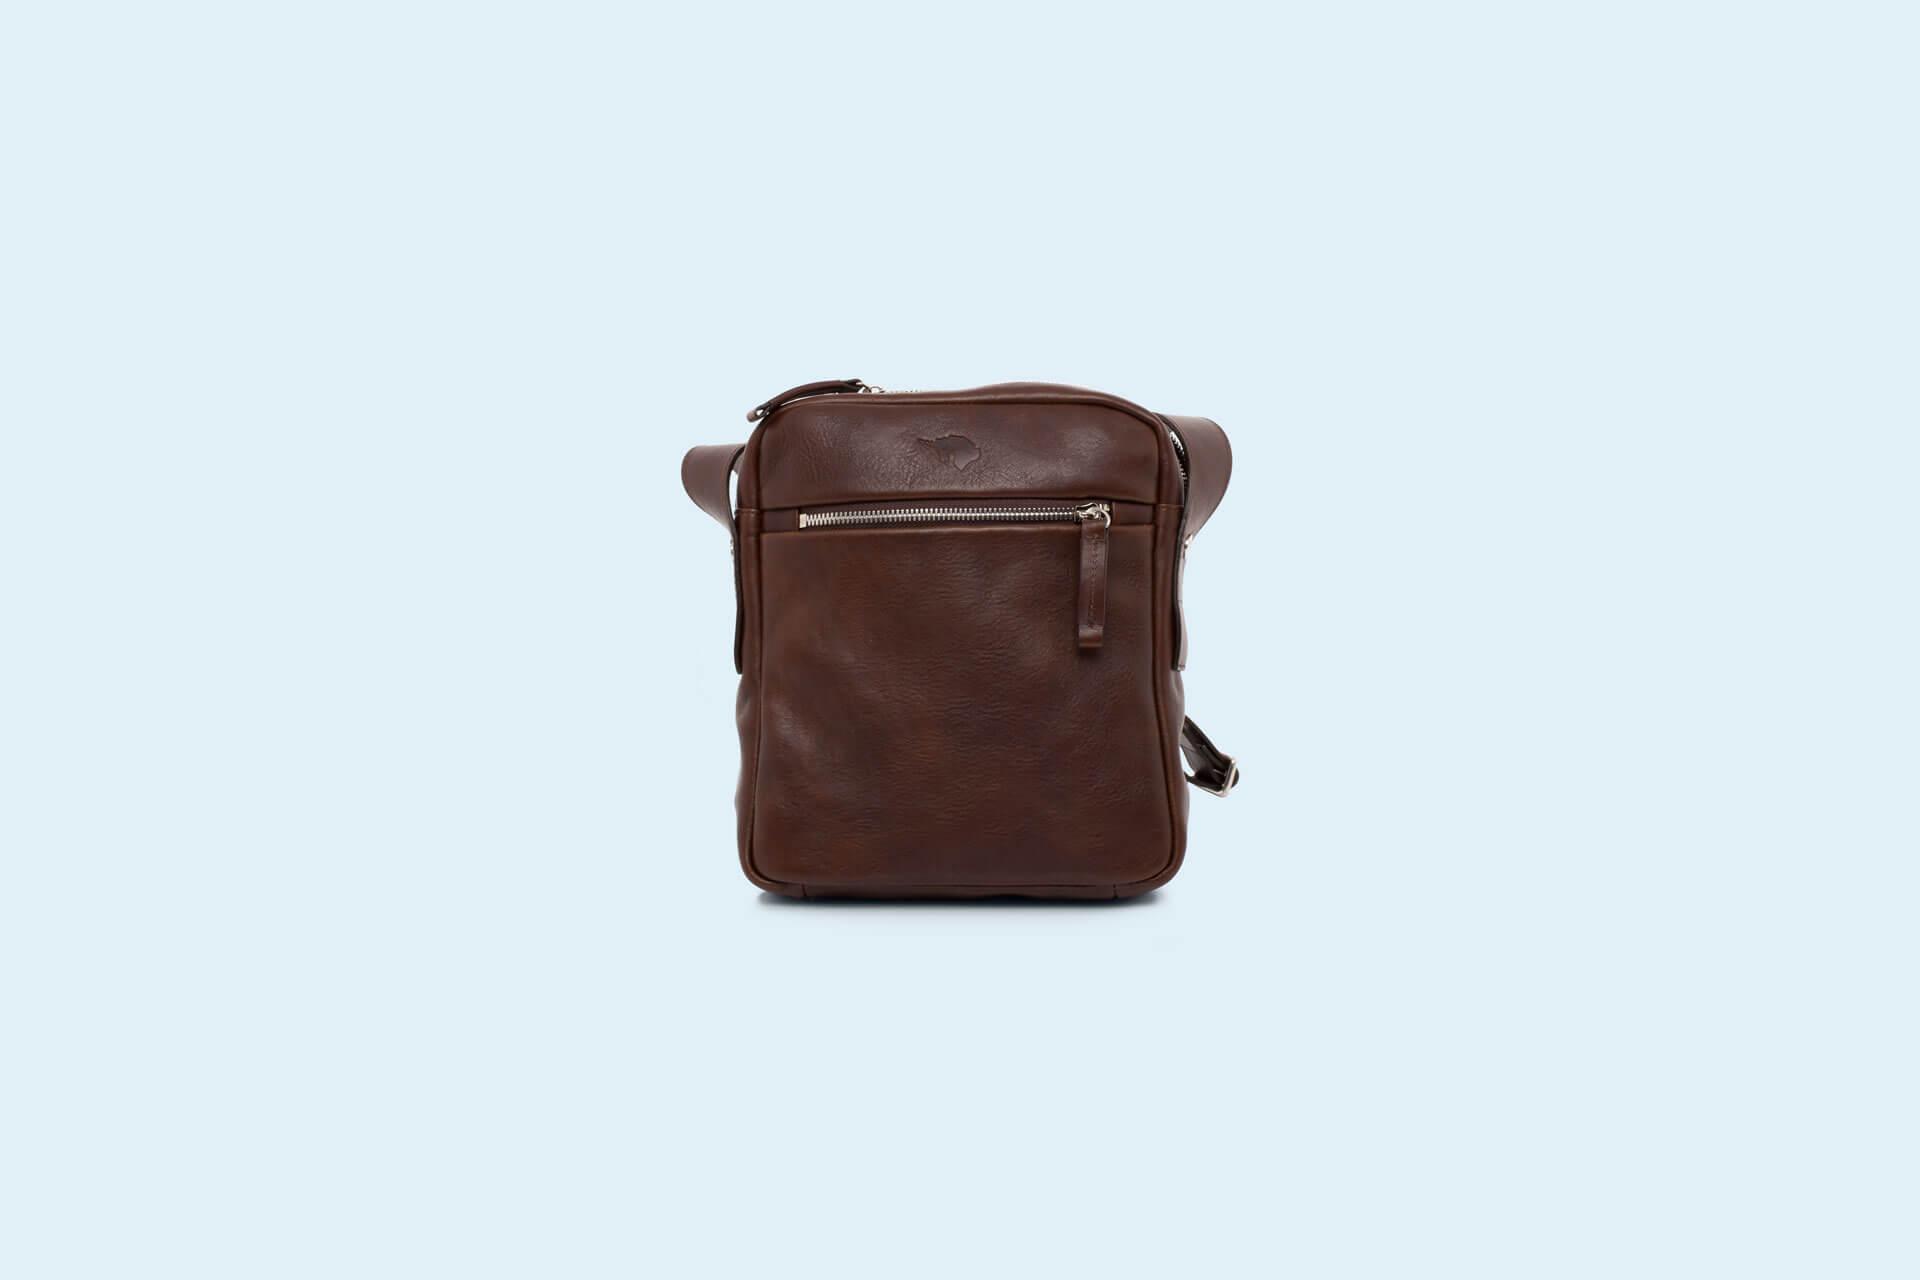 cc0dfaa545499 Skórzana listonoszka męska - Nonconformist Messenger small bag brown.  torba meska messenger braz.jpg